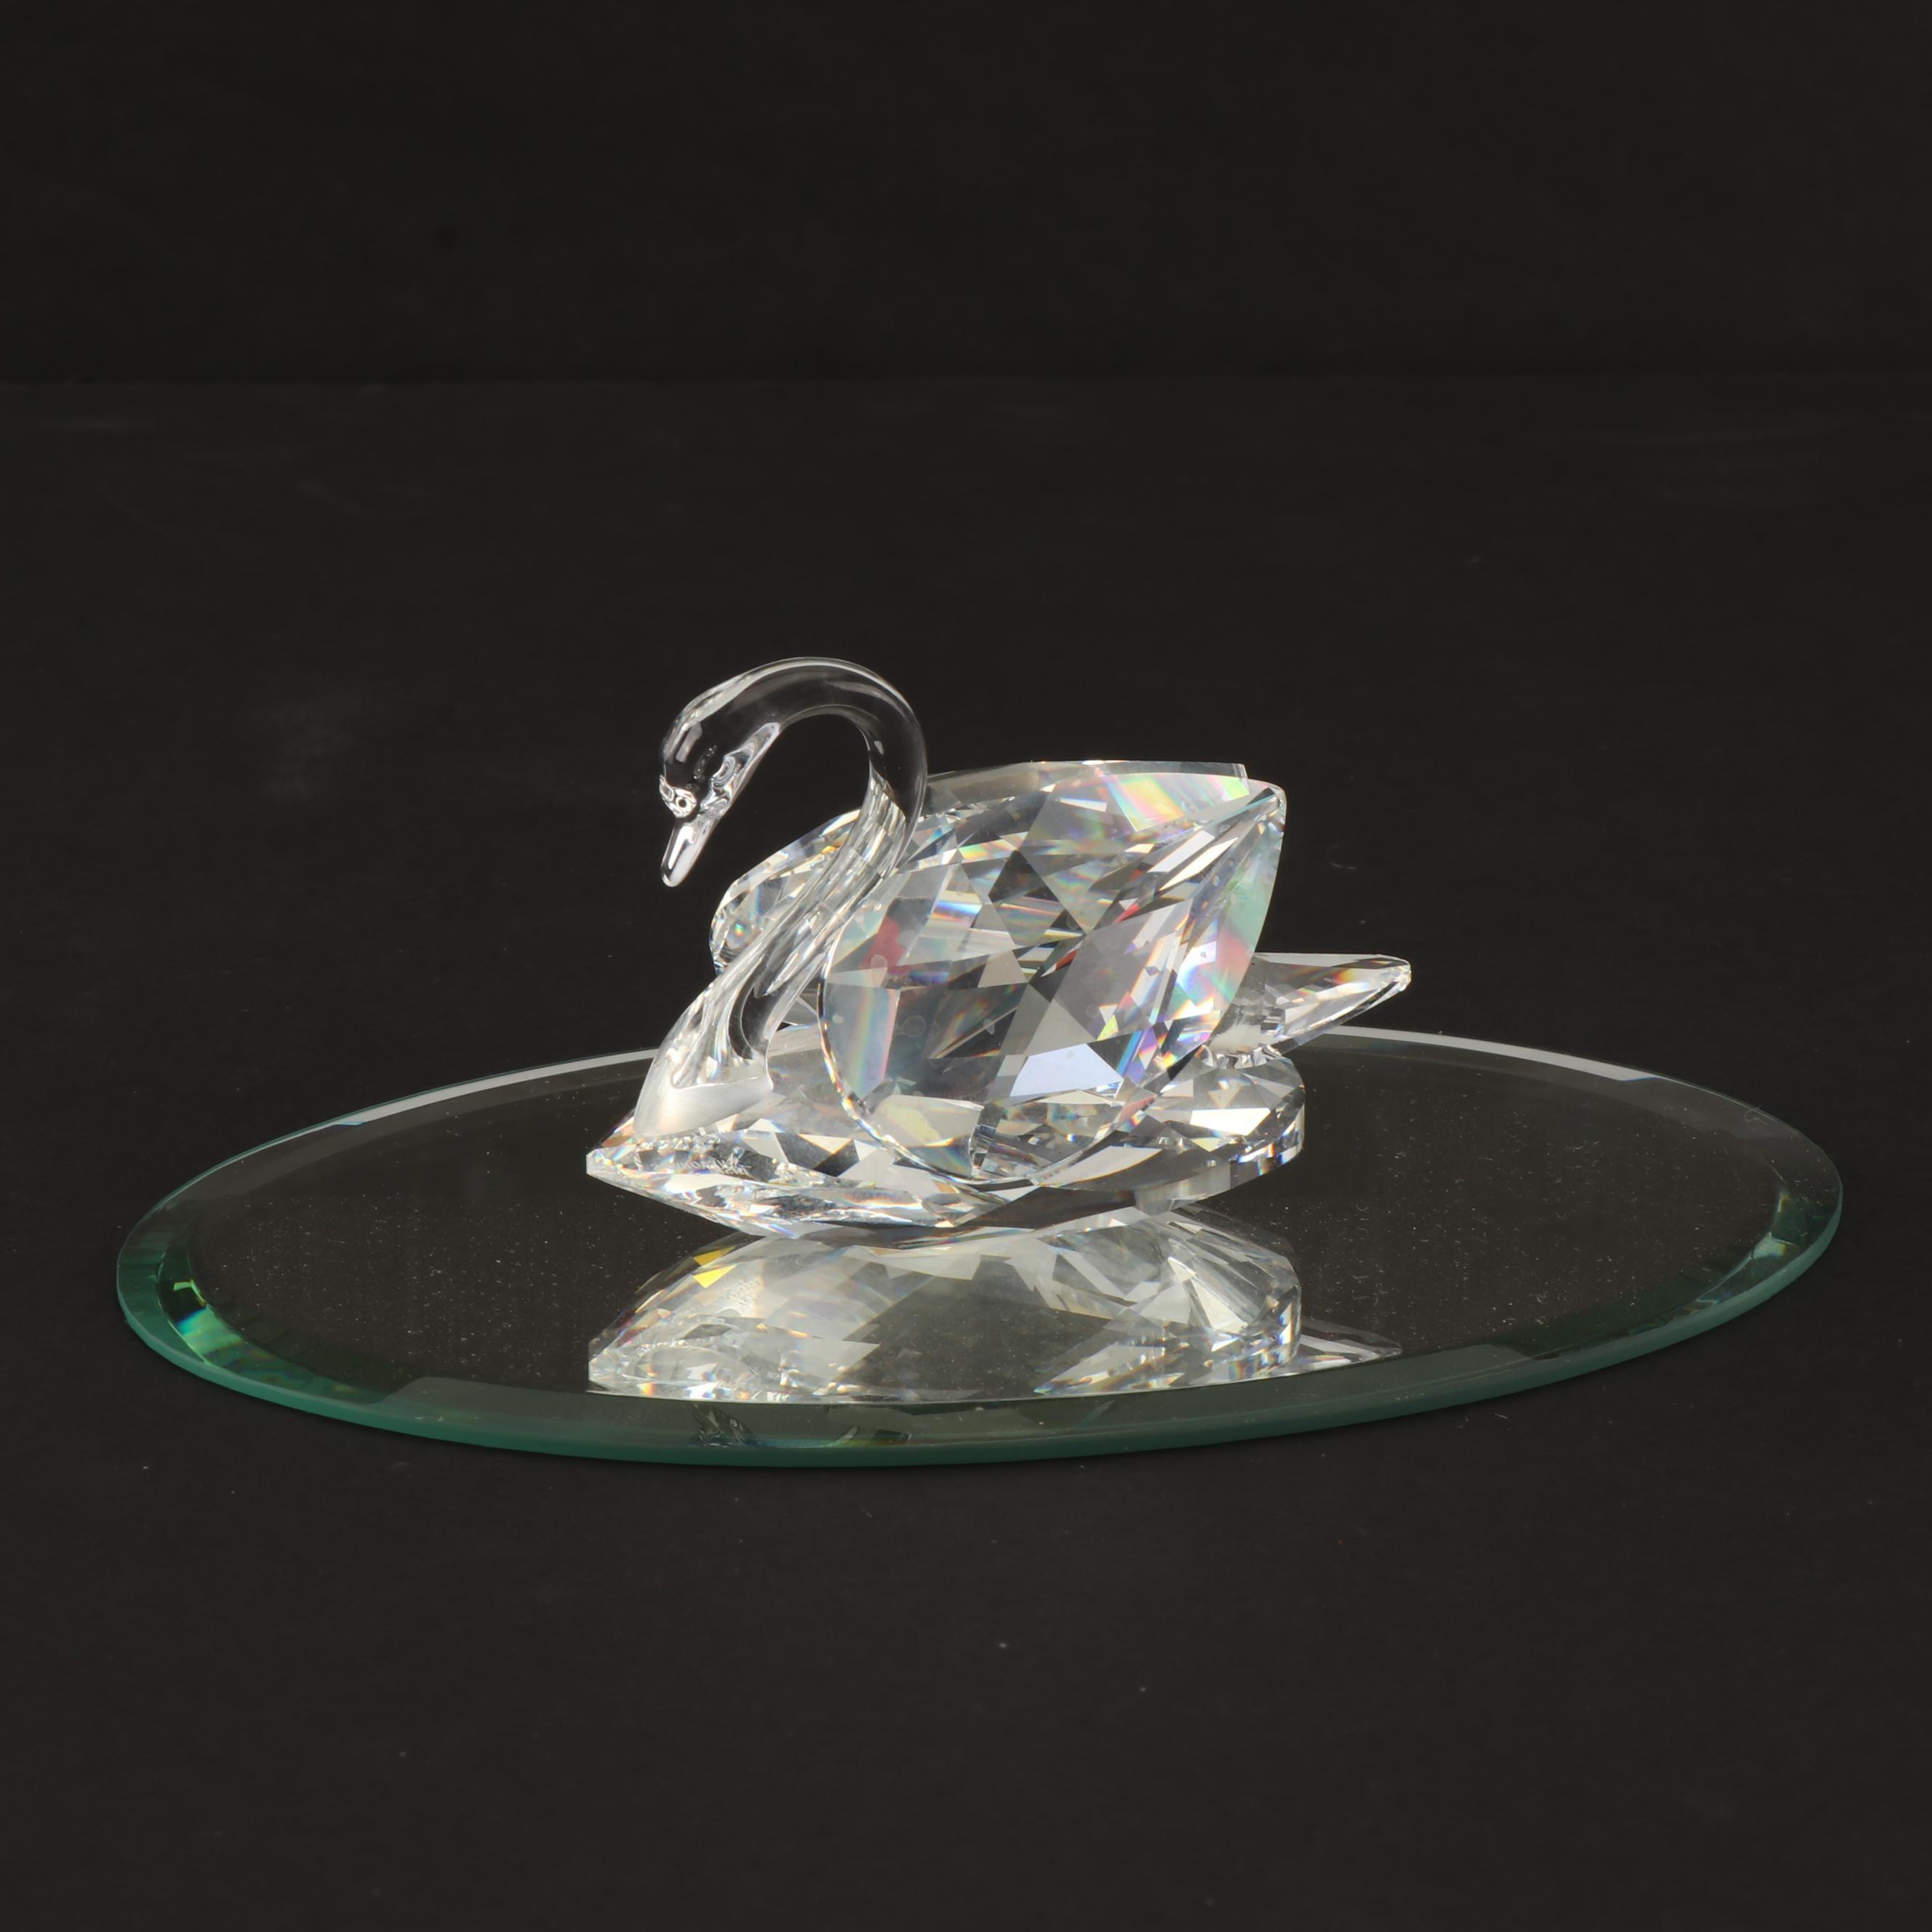 Swarovski Crystal Swan Figurine with Mirror Base